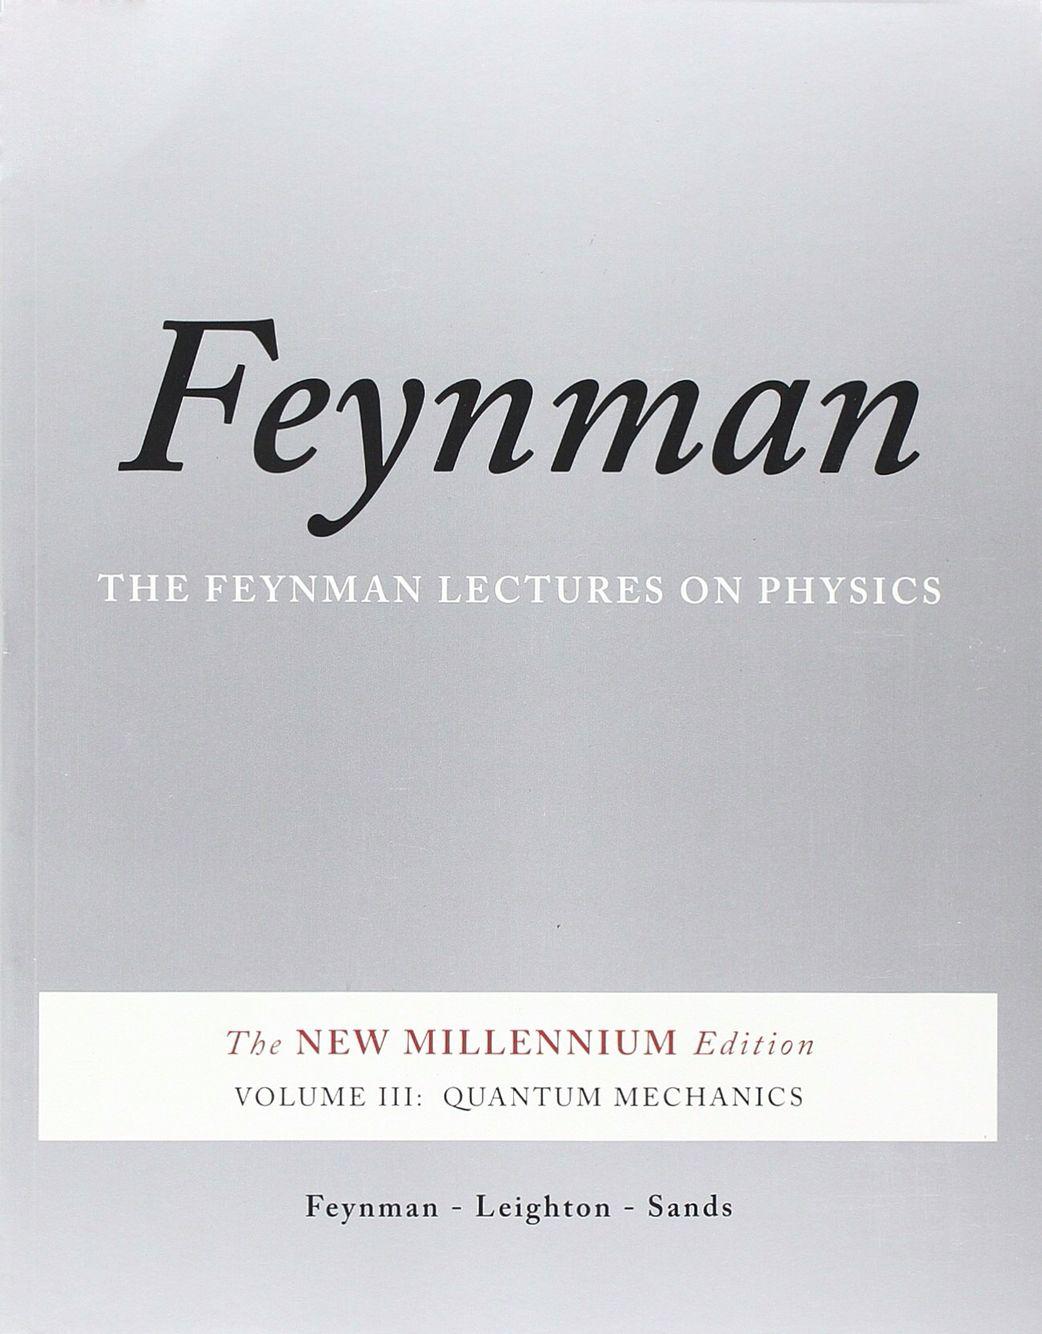 Richard Feynman | The Feynman Lectures on Physics (1964)